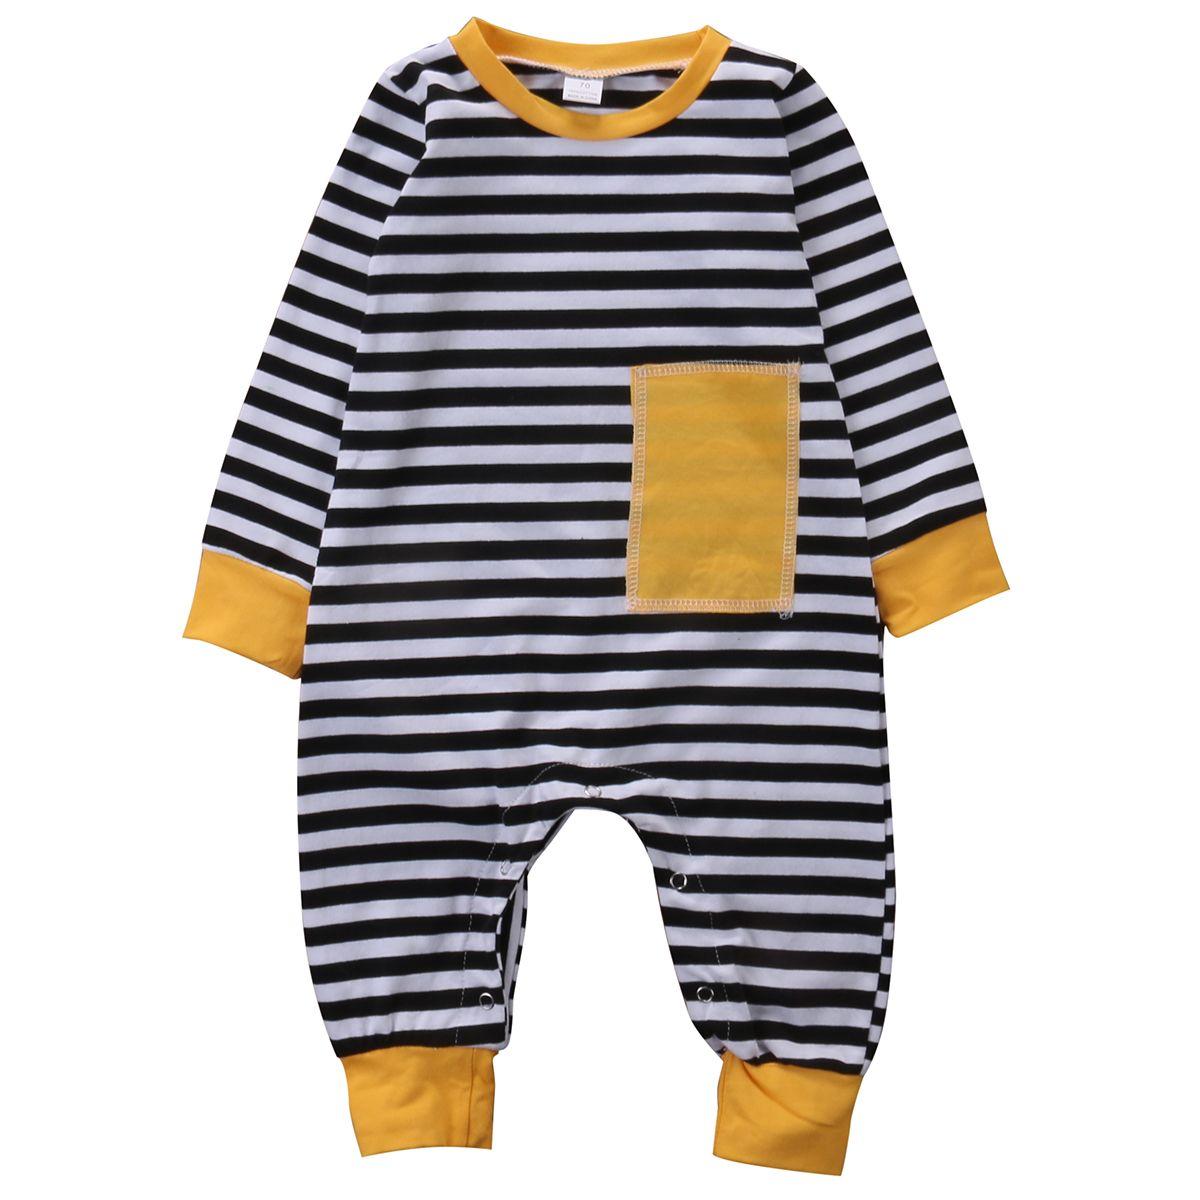 f31696faba Autumn Newborn Kids Baby Boy Long Sleeve Romper Striped Cotton ...